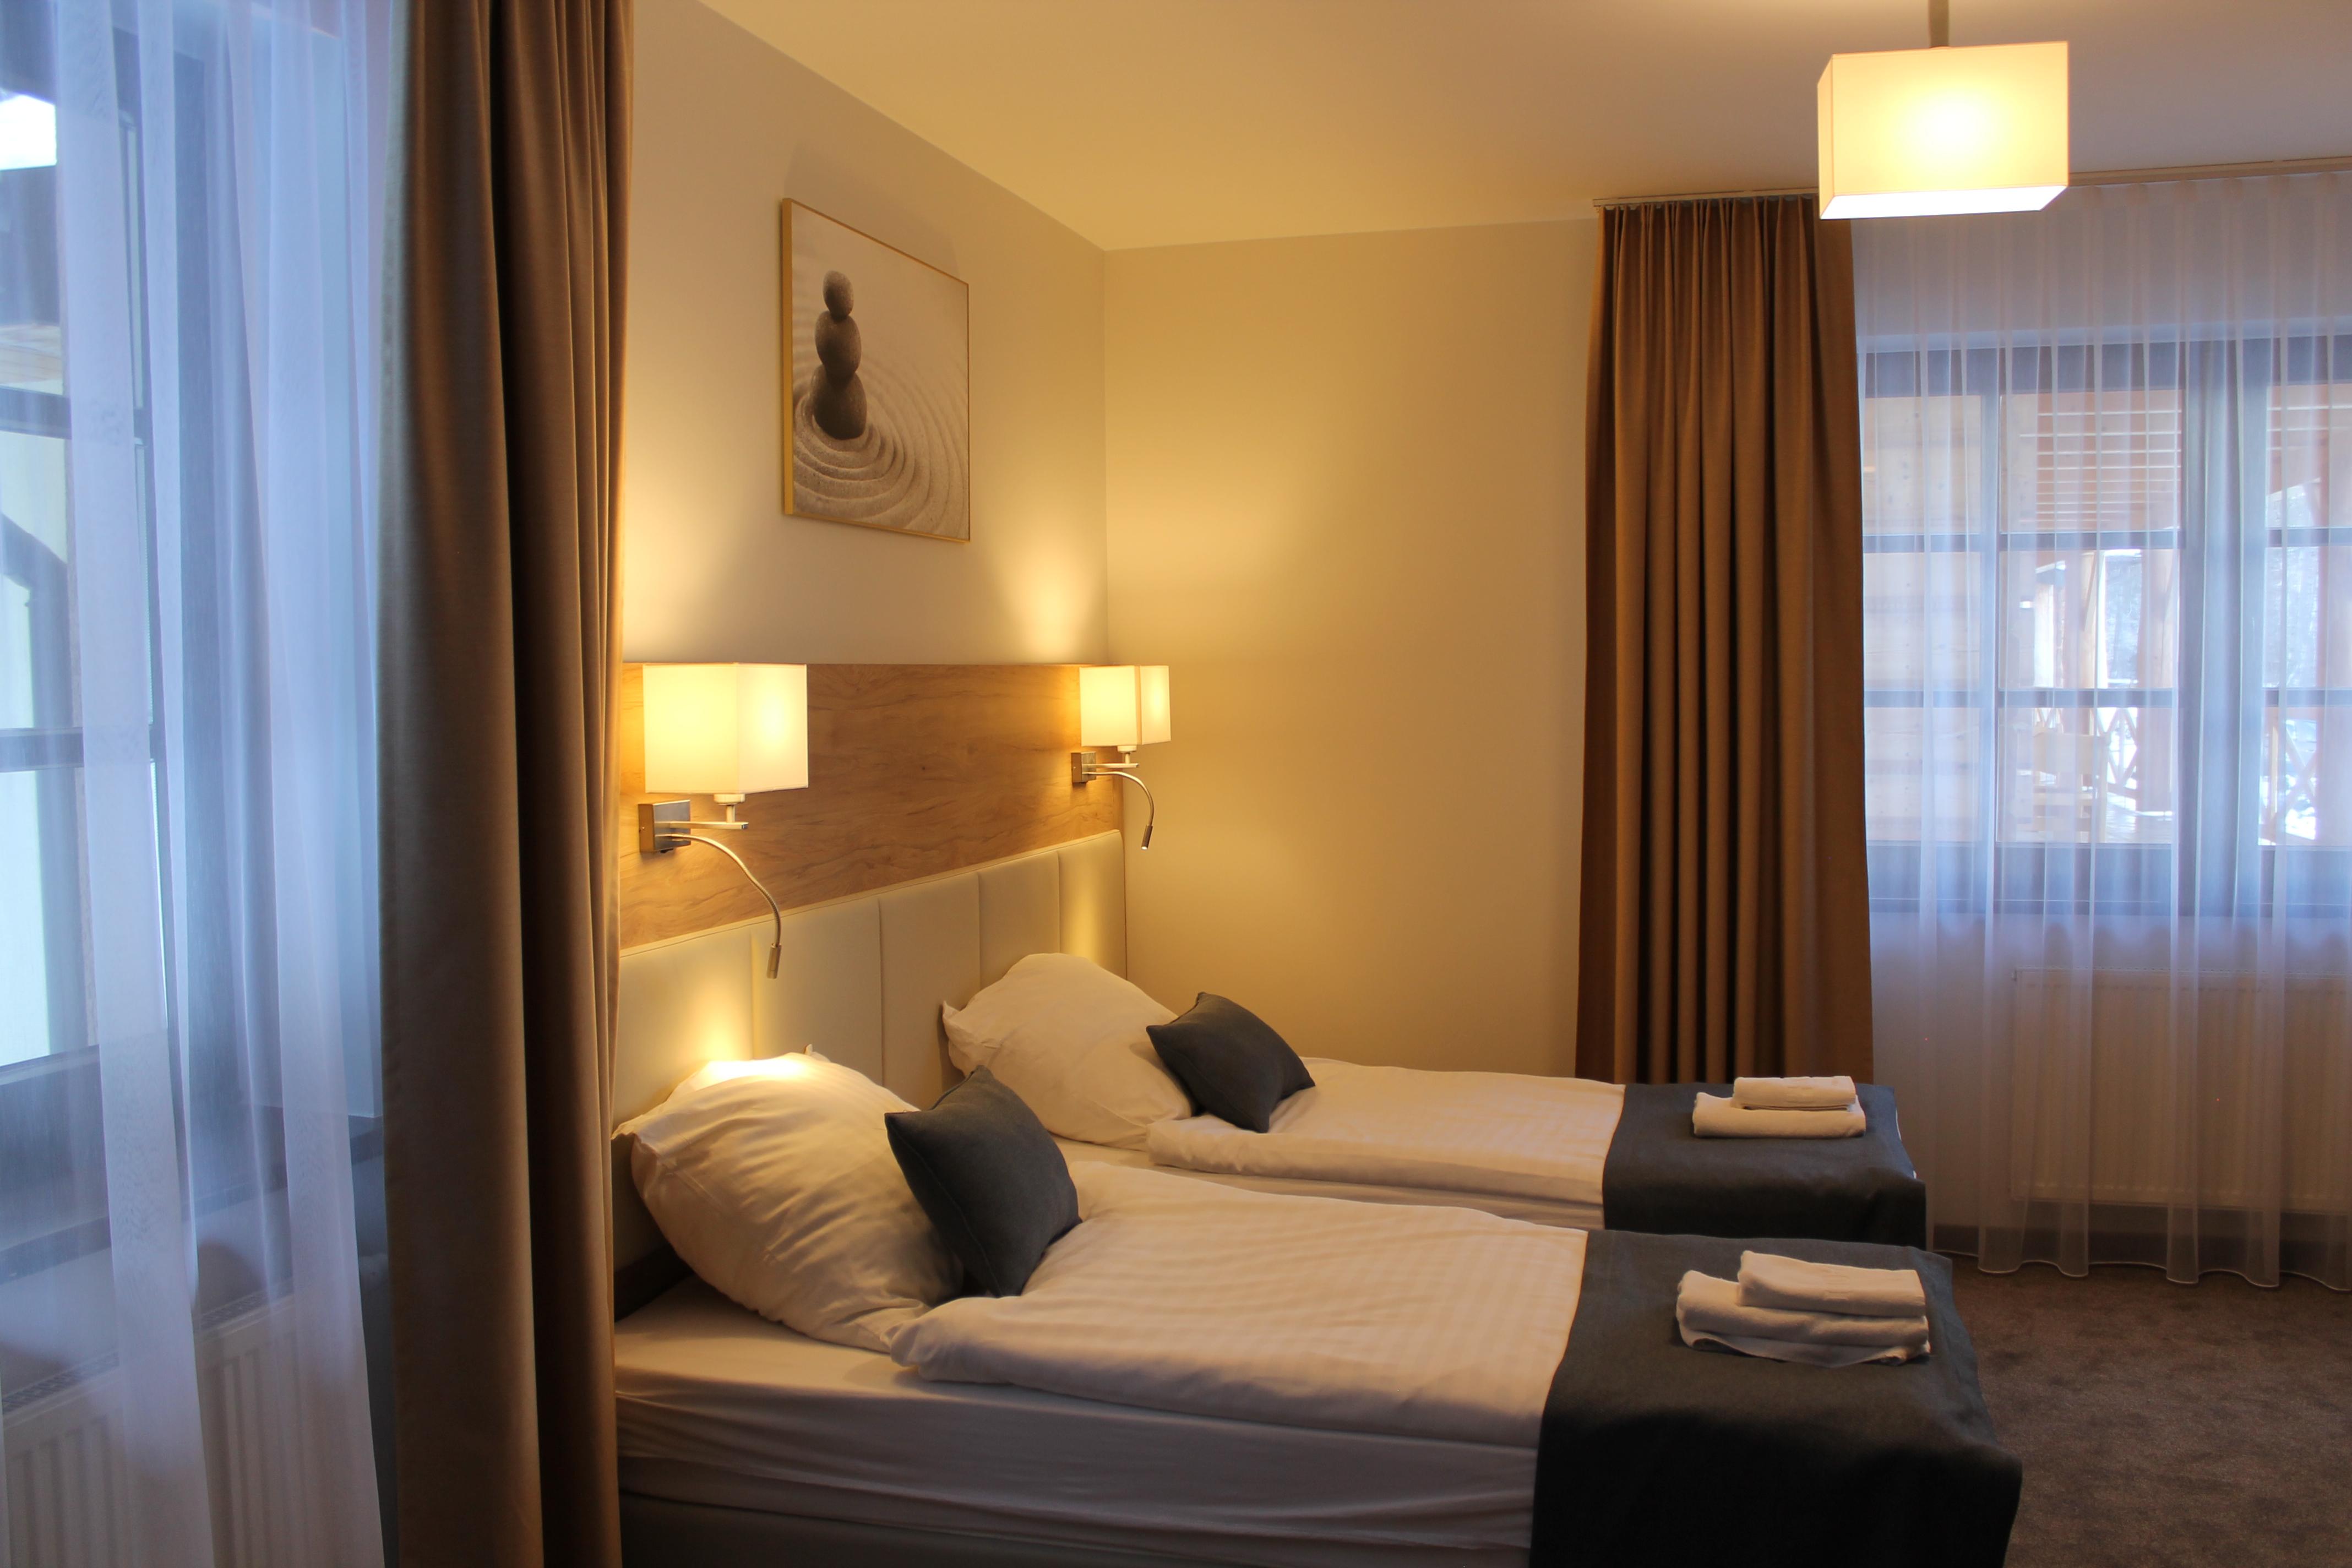 http://www.hotel-lipnica.pl/wp-content/uploads/2020/02/05_02.jpg